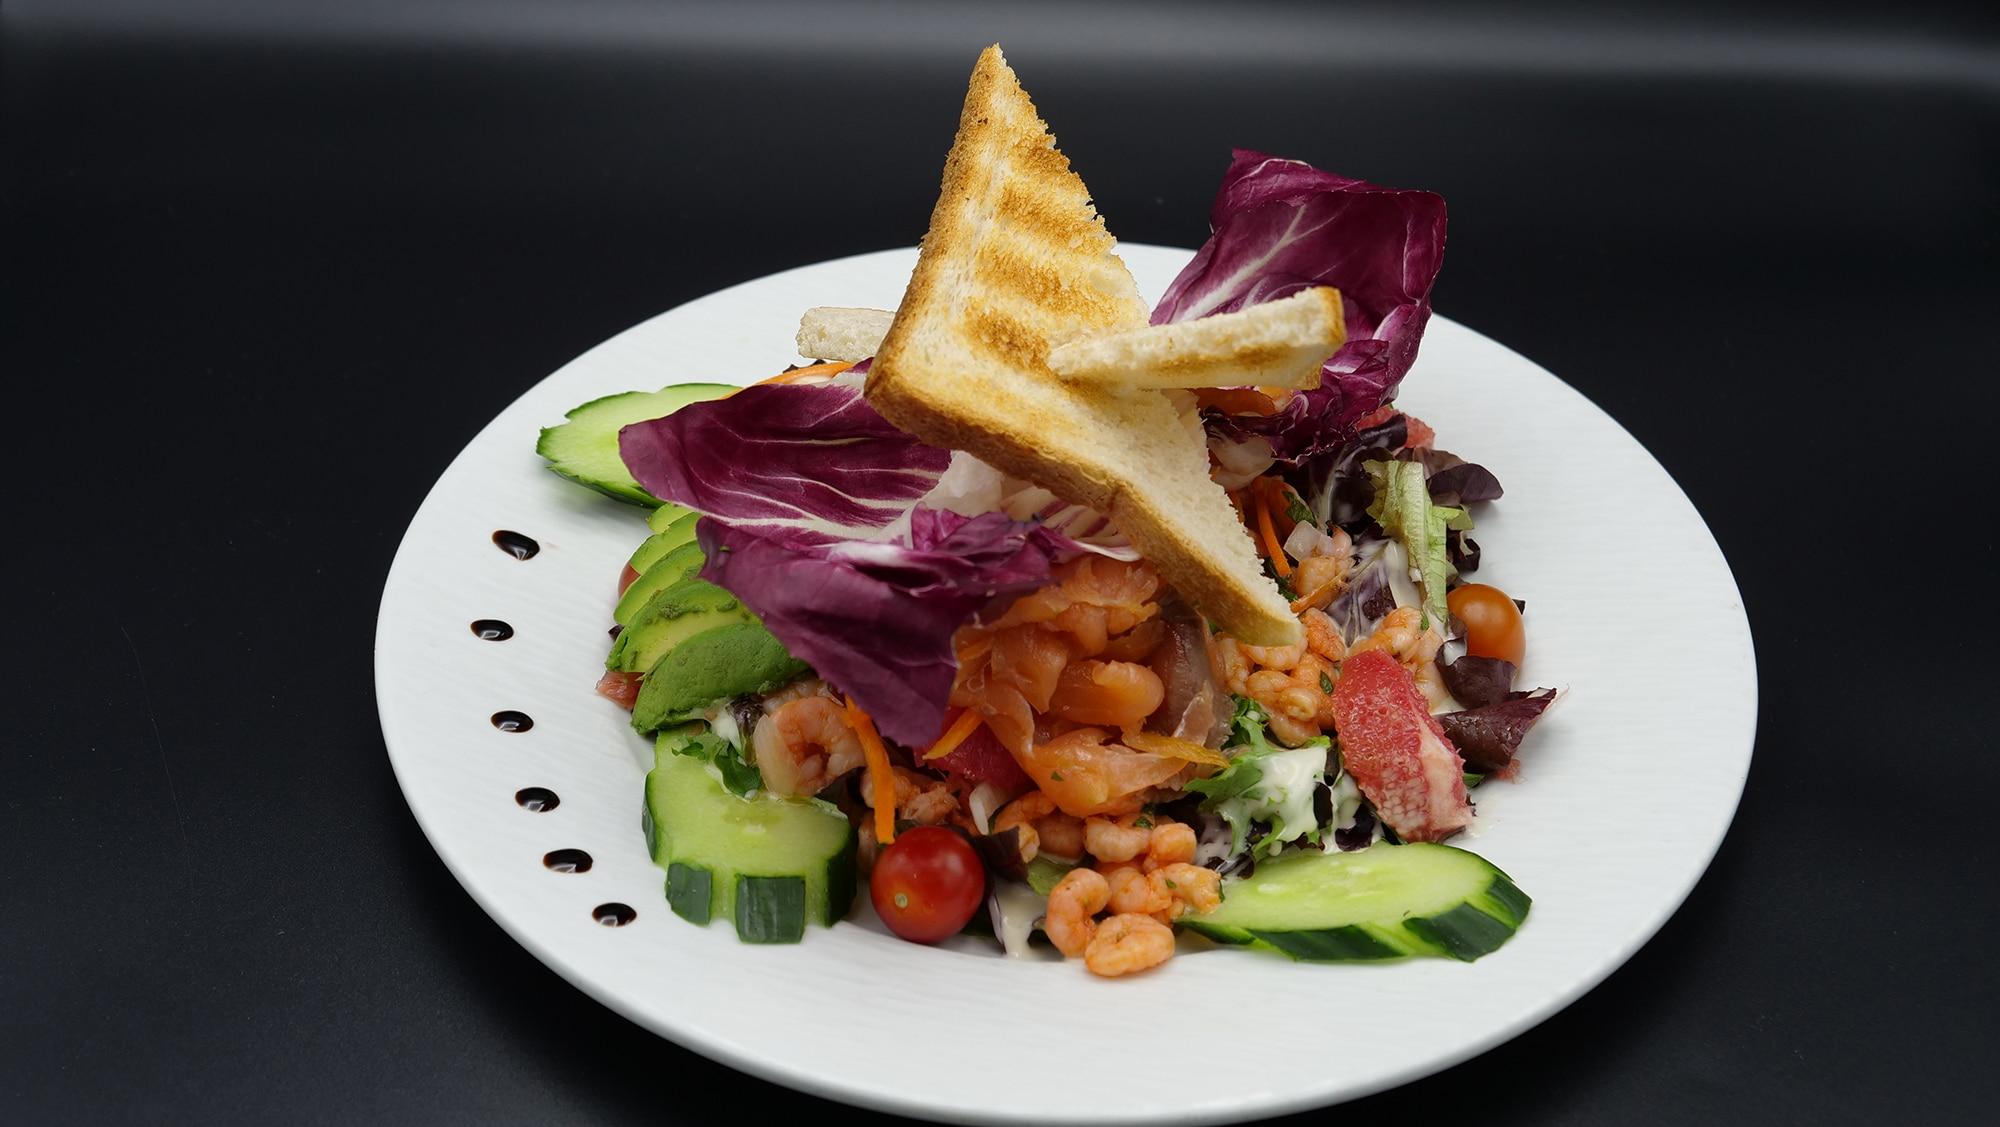 salade-oceane-grey-sud-5